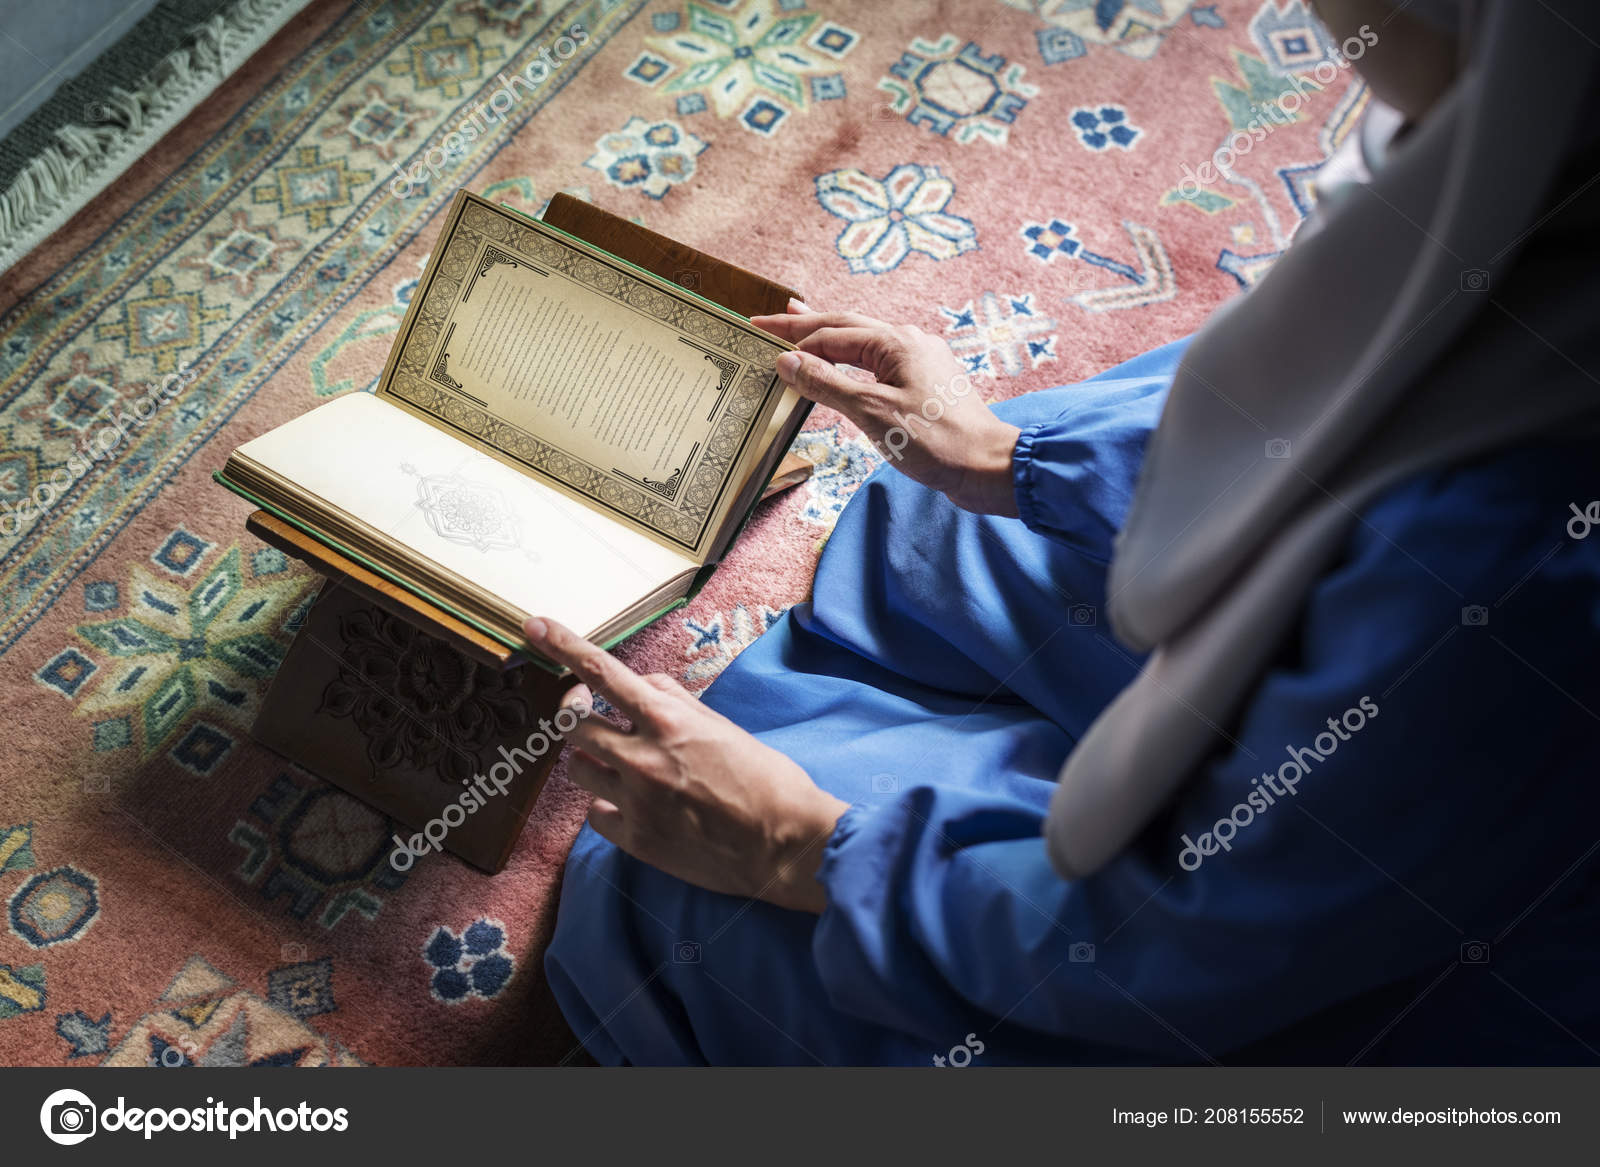 Muslim woman reading quran | Muslim Woman Reading Quran